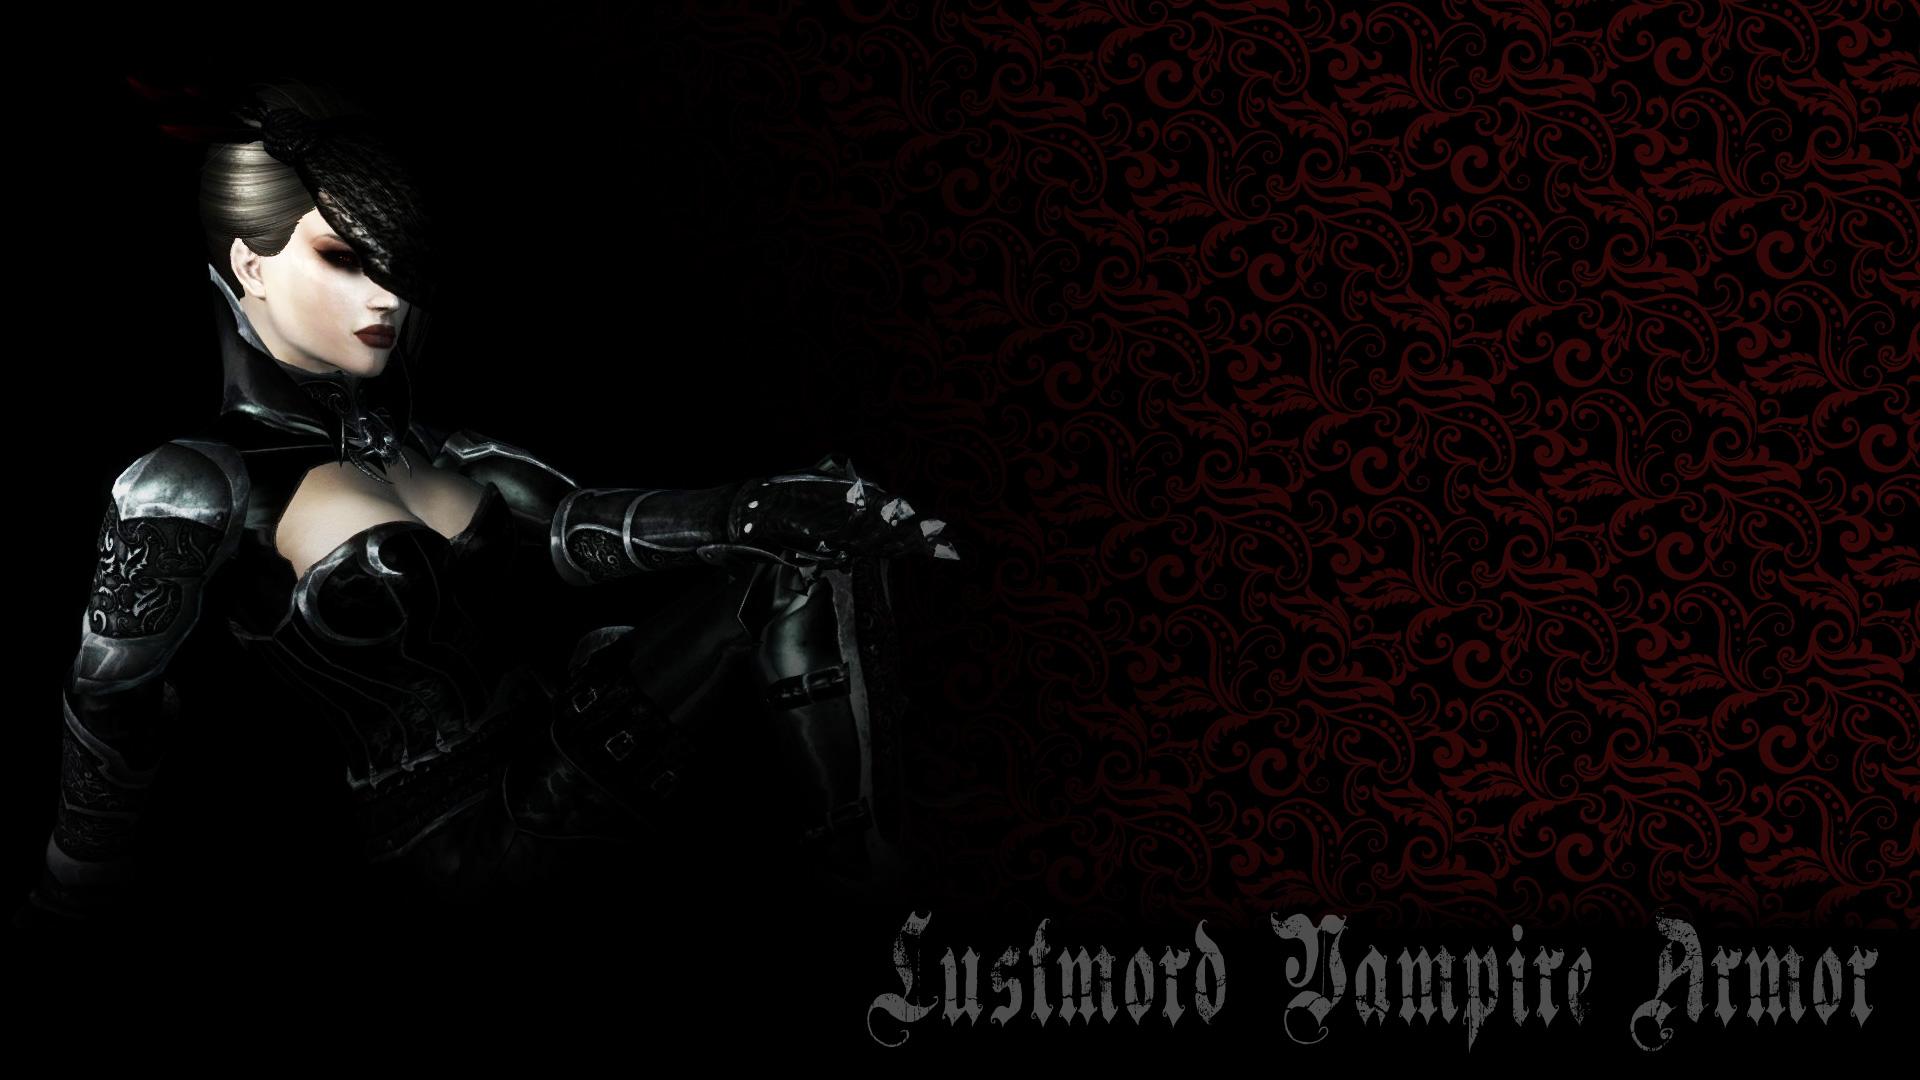 Lustmord_Vampire_Armor.jpg